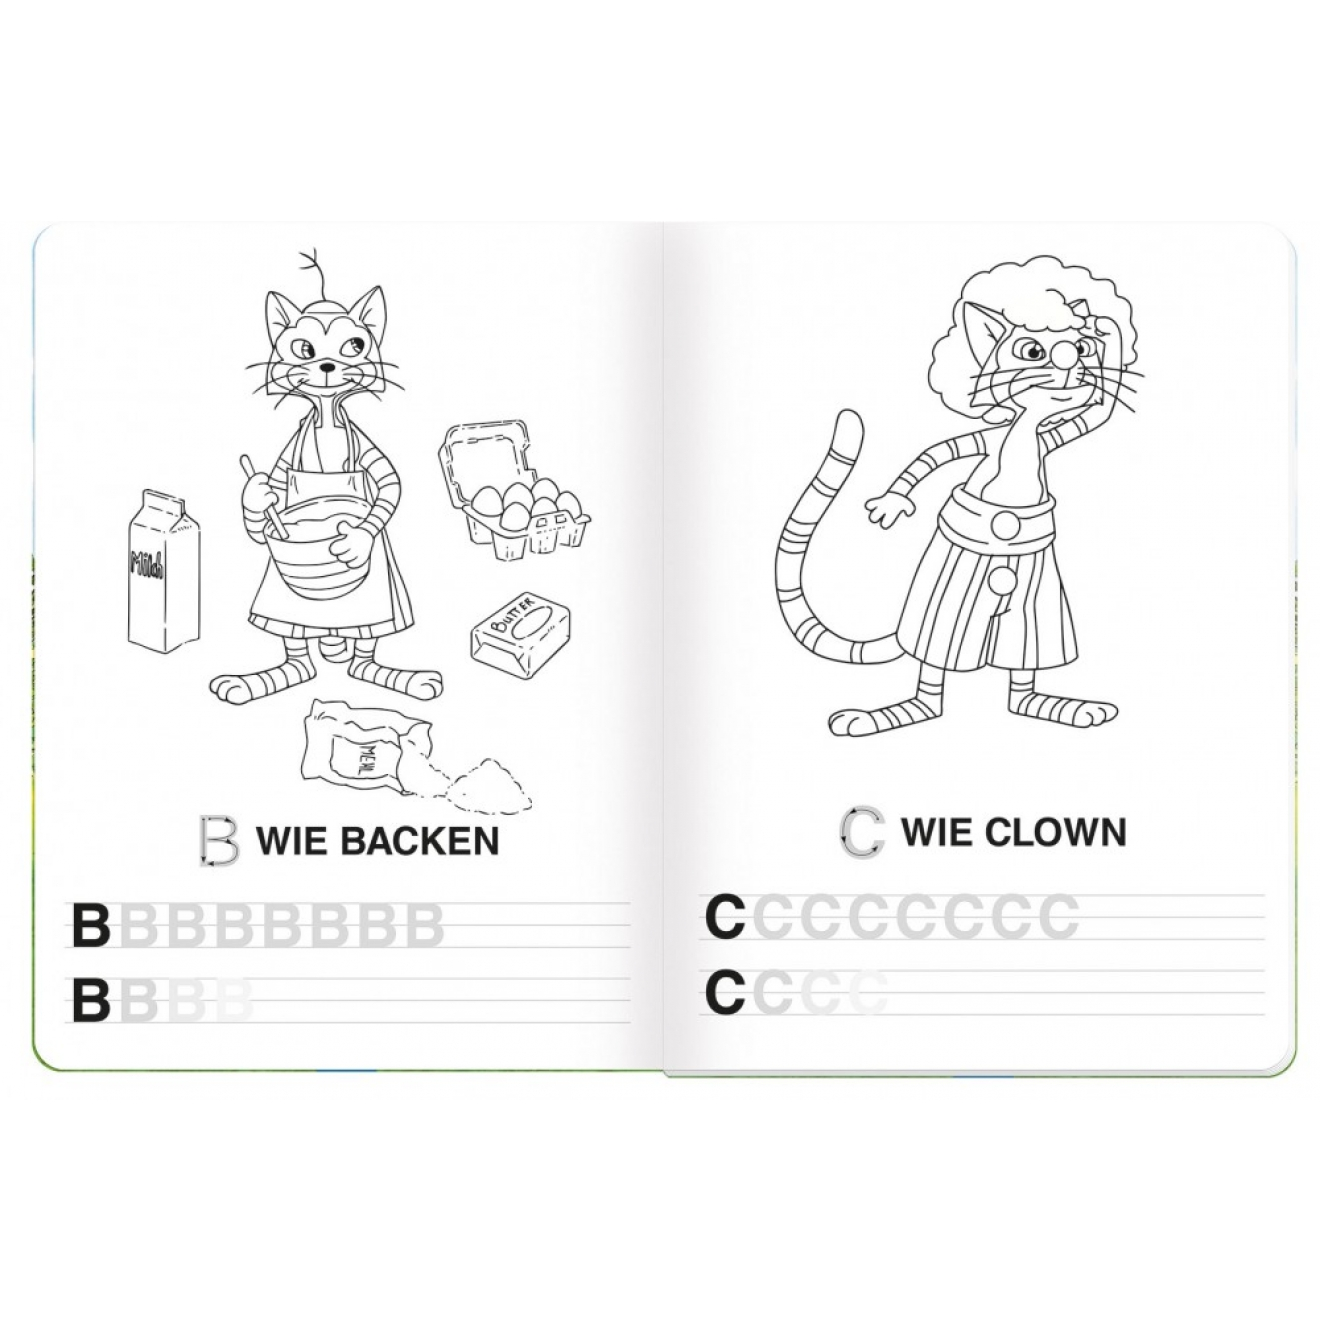 ABC-Malbuch Pettersson & Findus, Trötsch Verlag Online-Shop